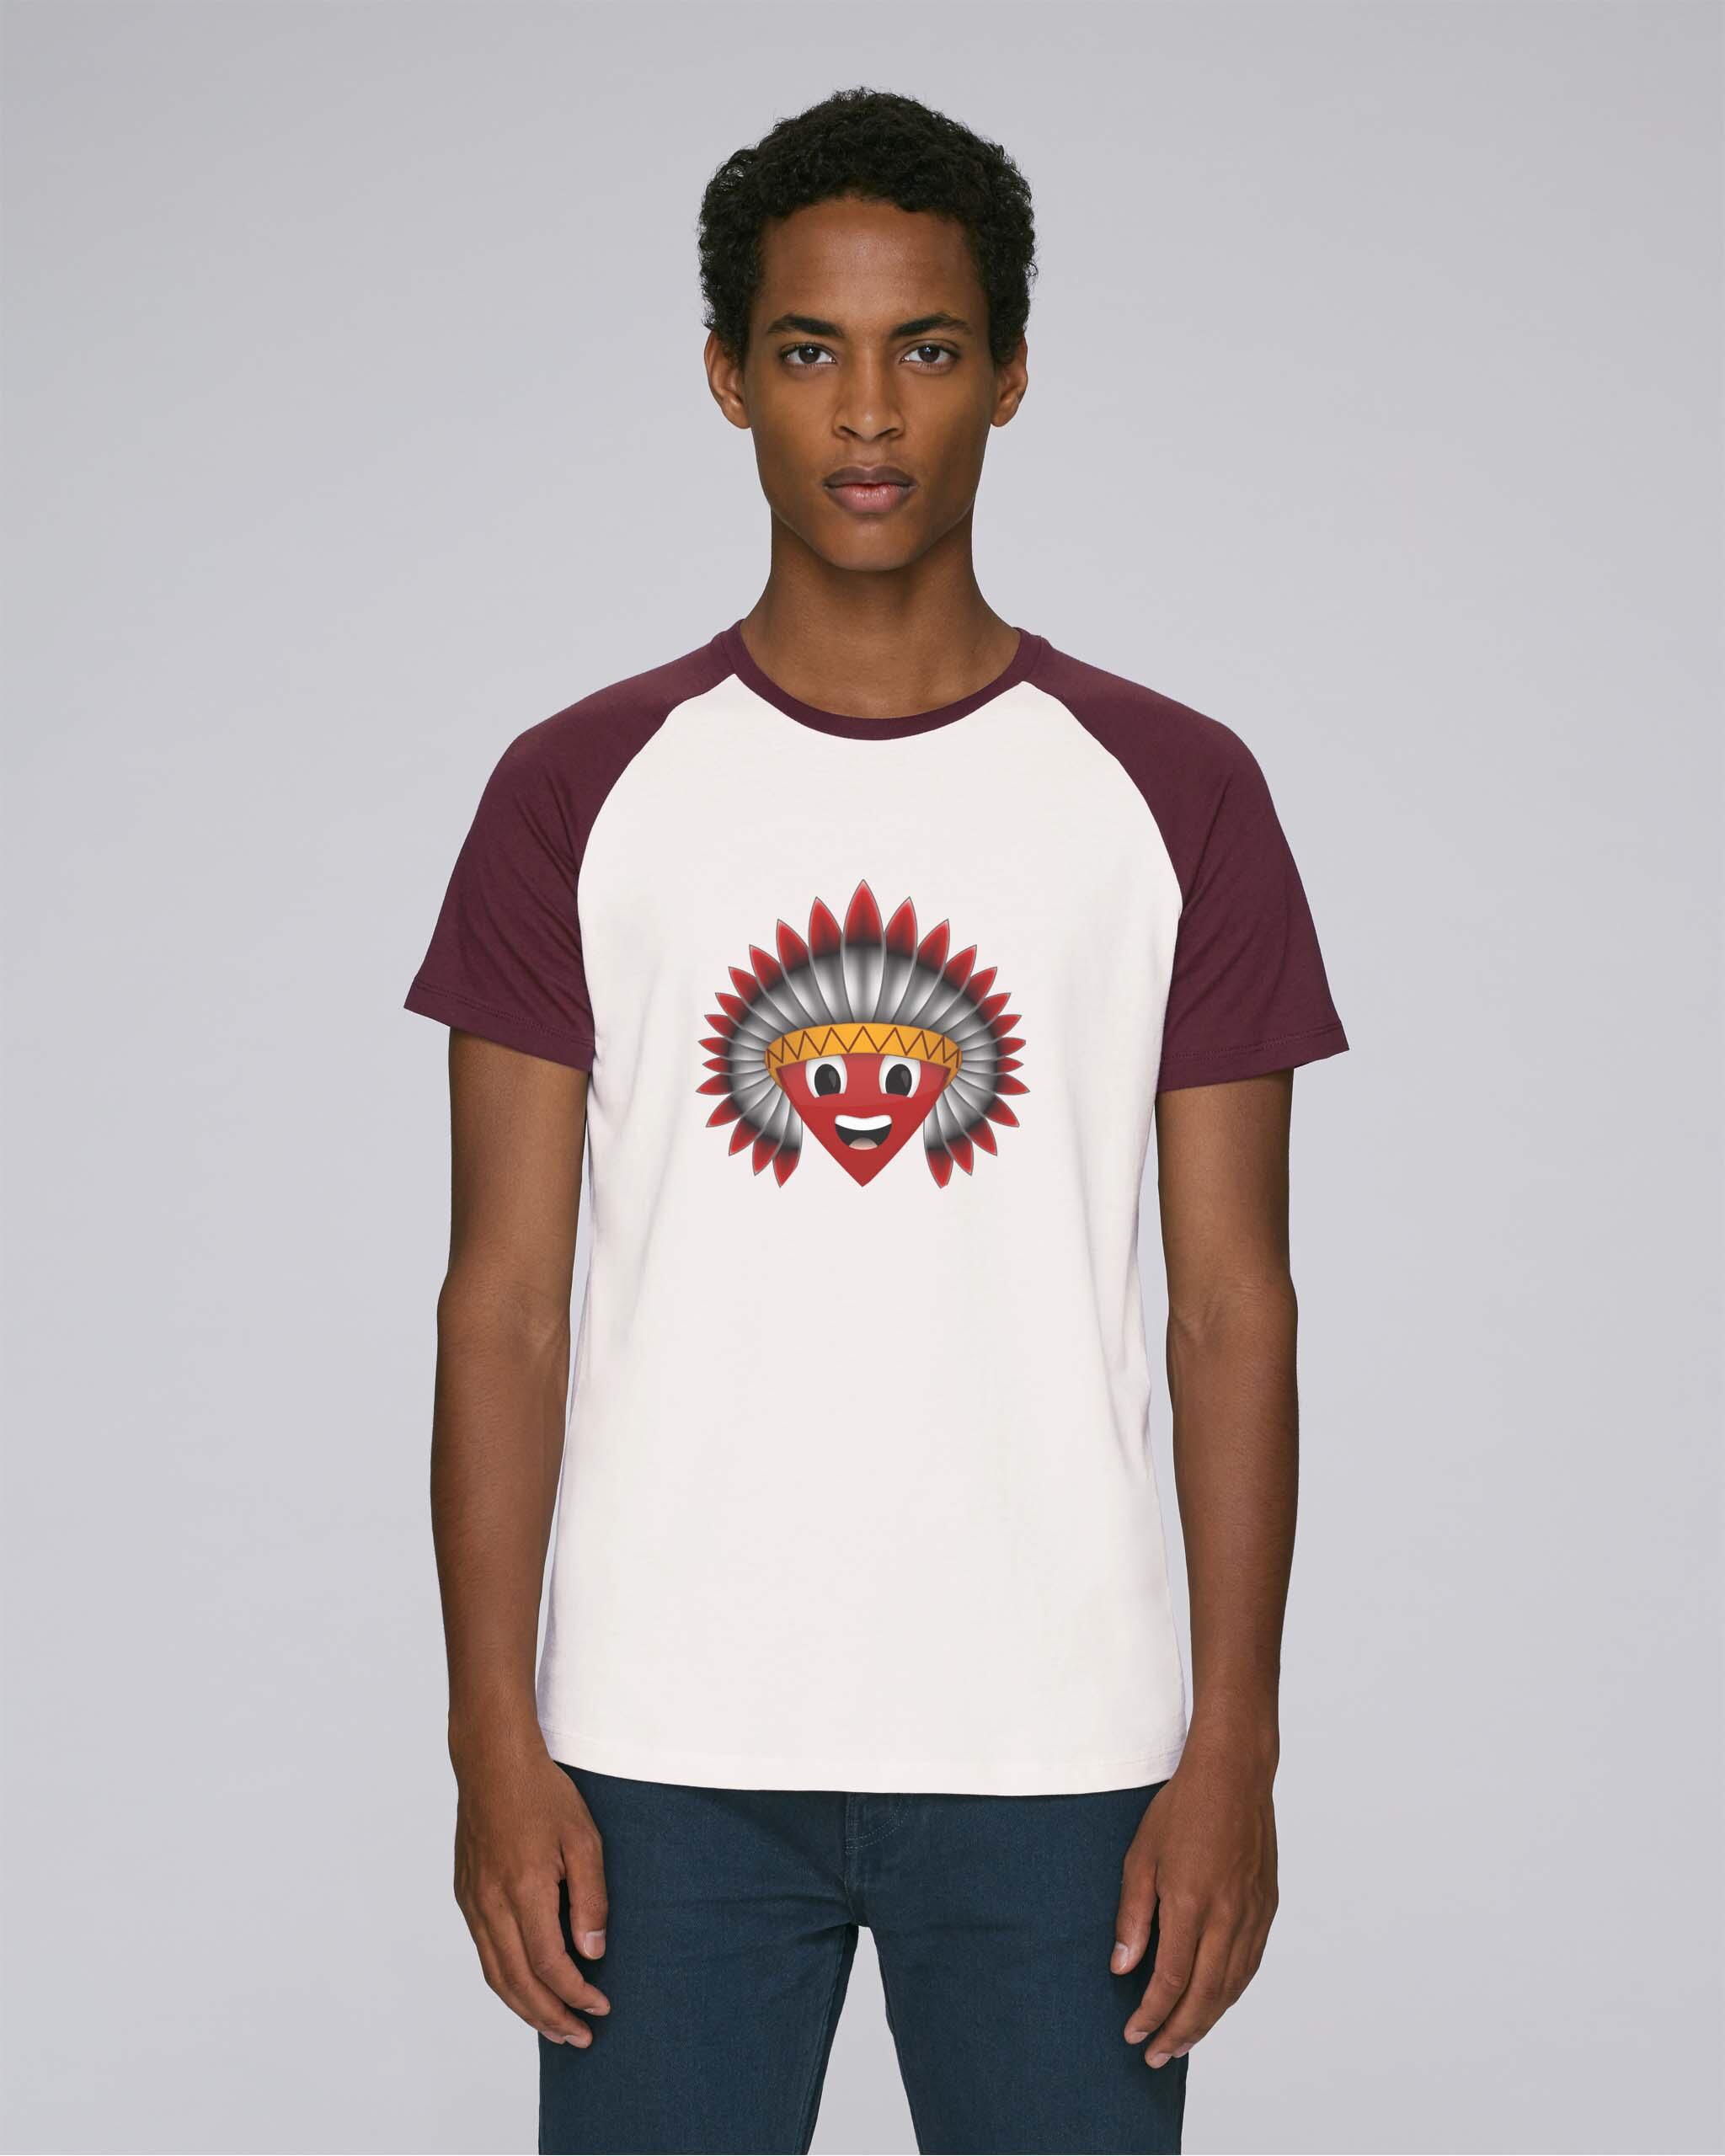 t-shirt bio bordeaux homme - Navajos Baseball tee